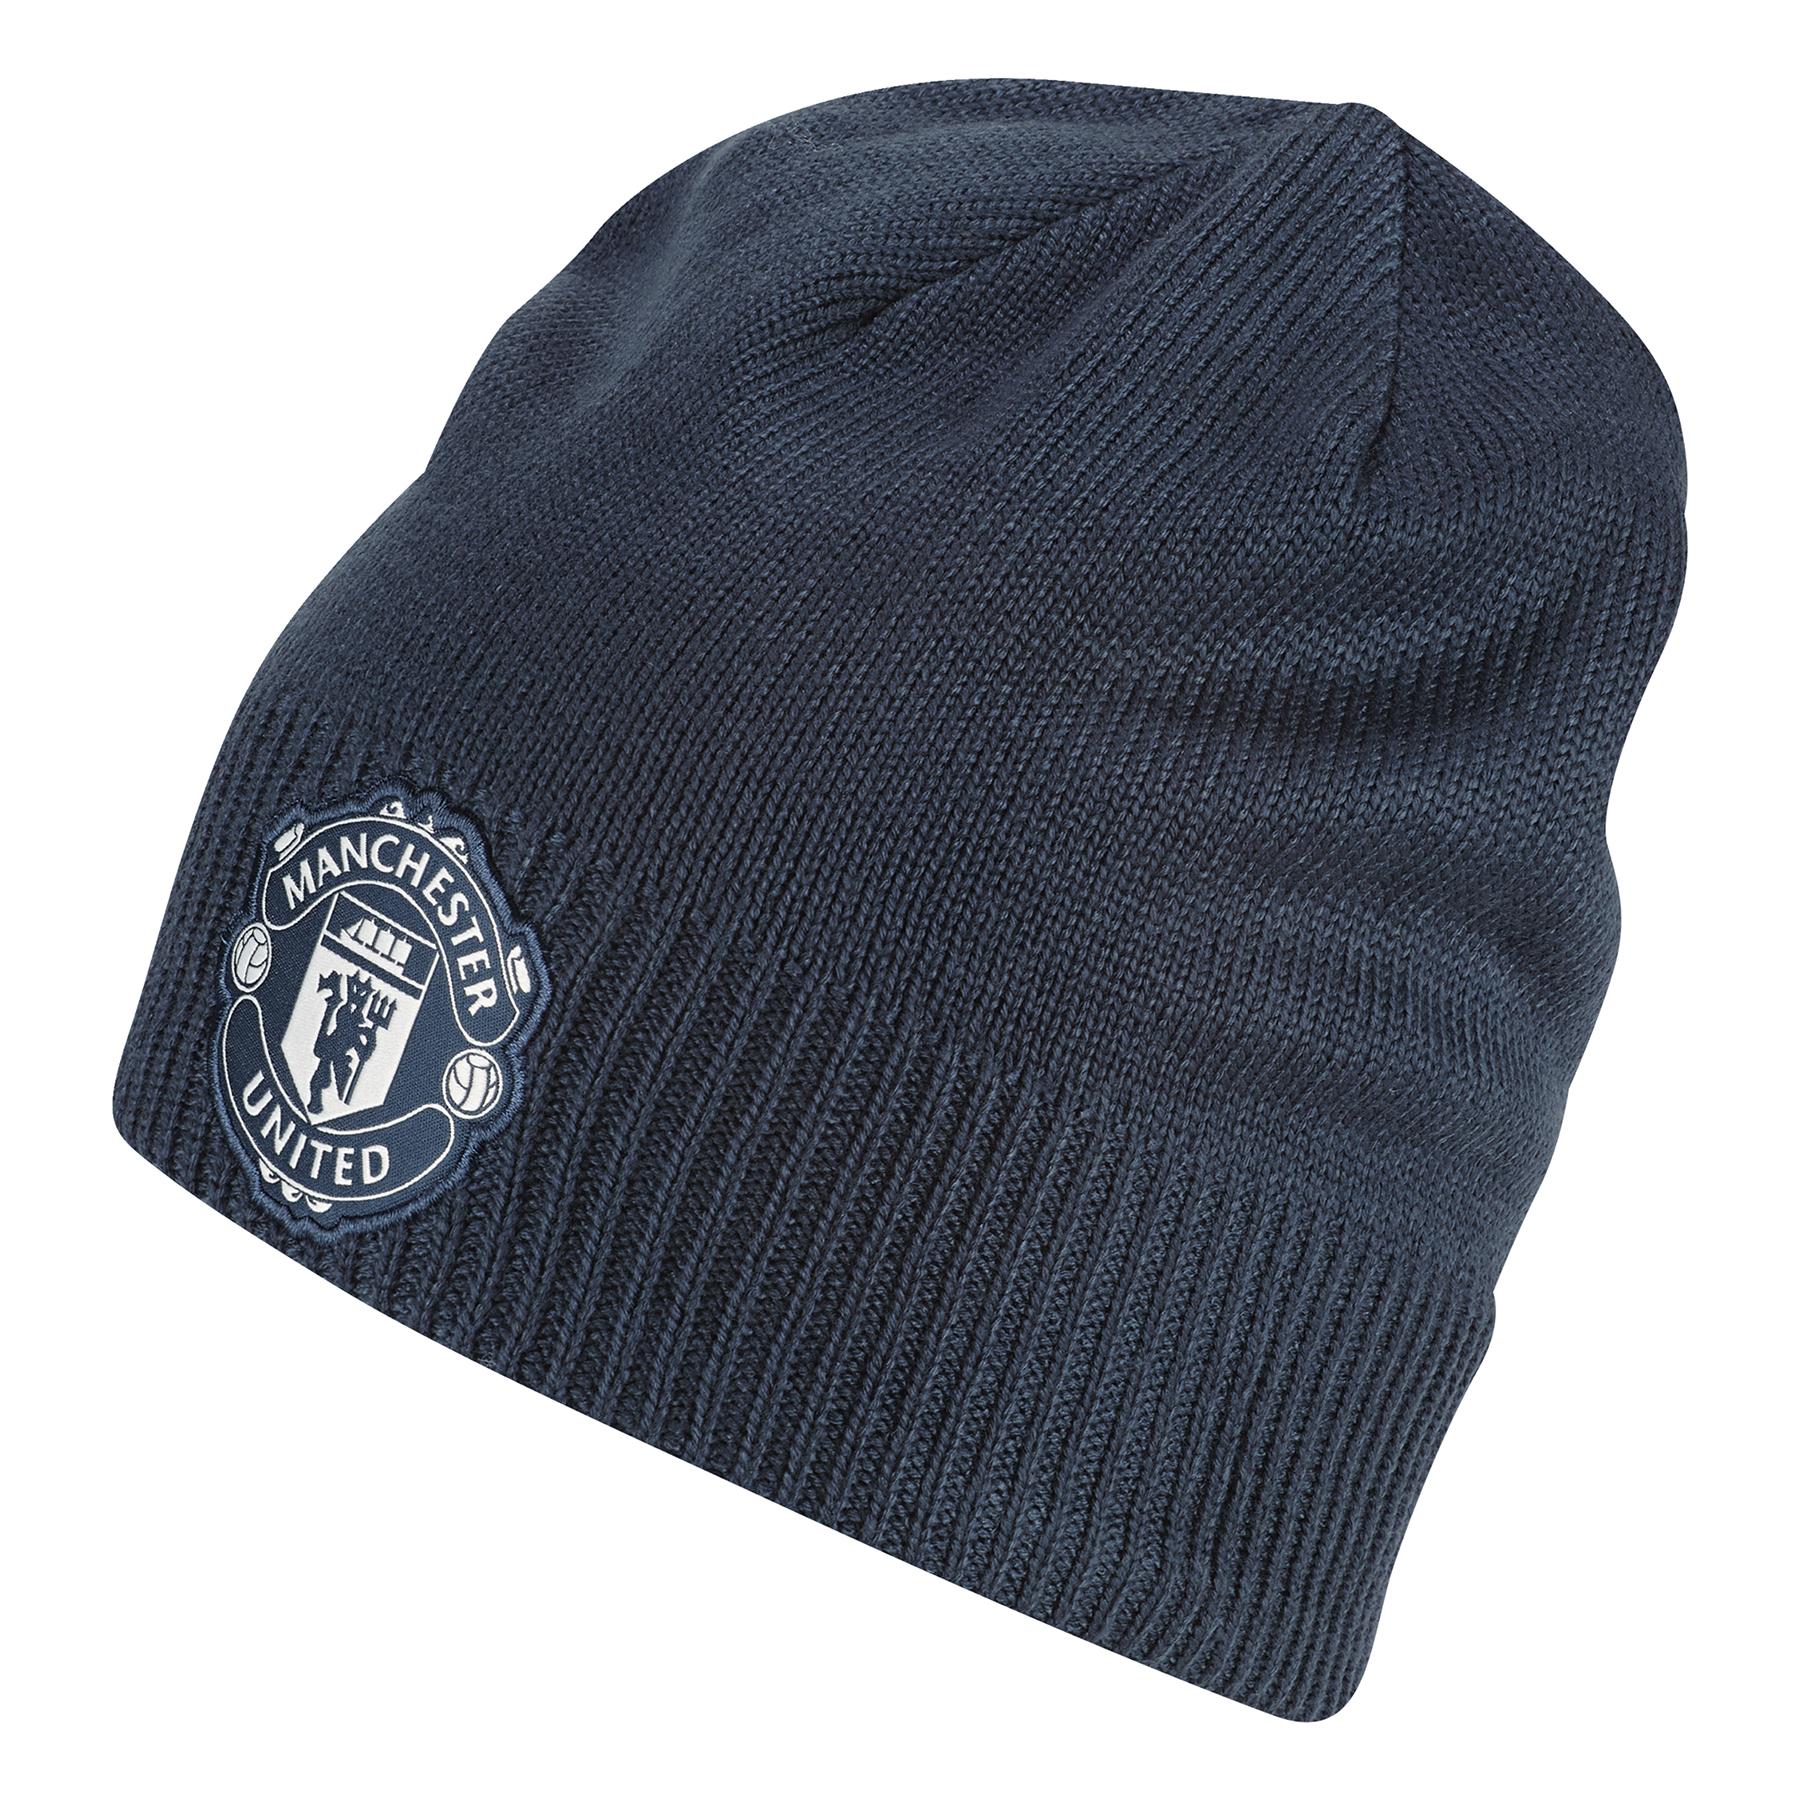 Manchester United Beanie - Blue